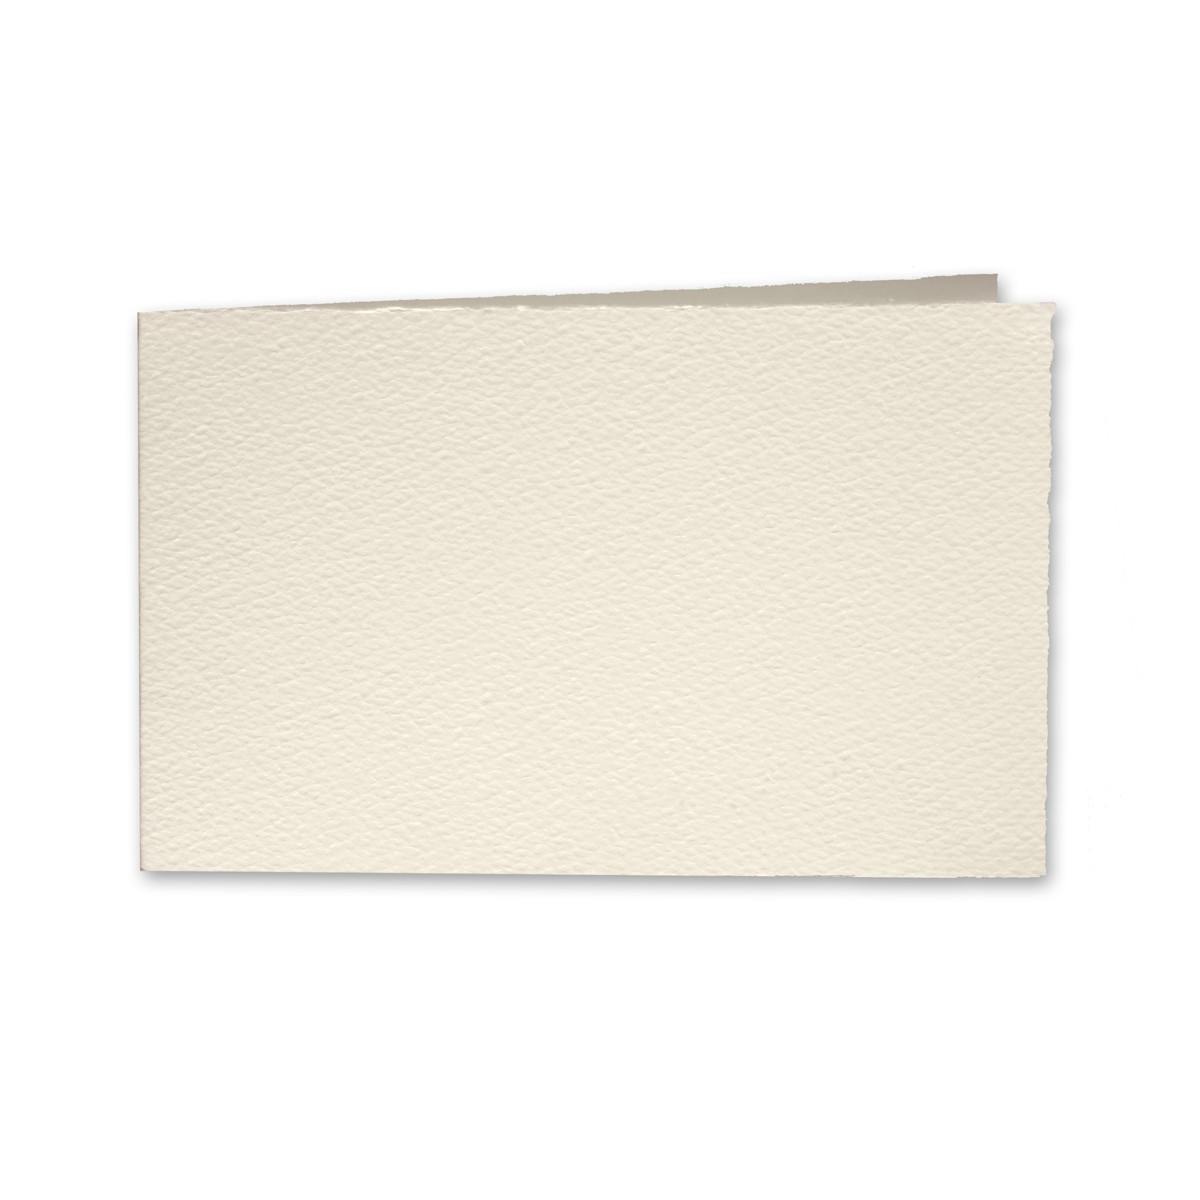 "Arturo Soft White Album Foldovers (600AC) 97# Cover (4.53"" x 13.39"" open size) Bulk Pack of 100"